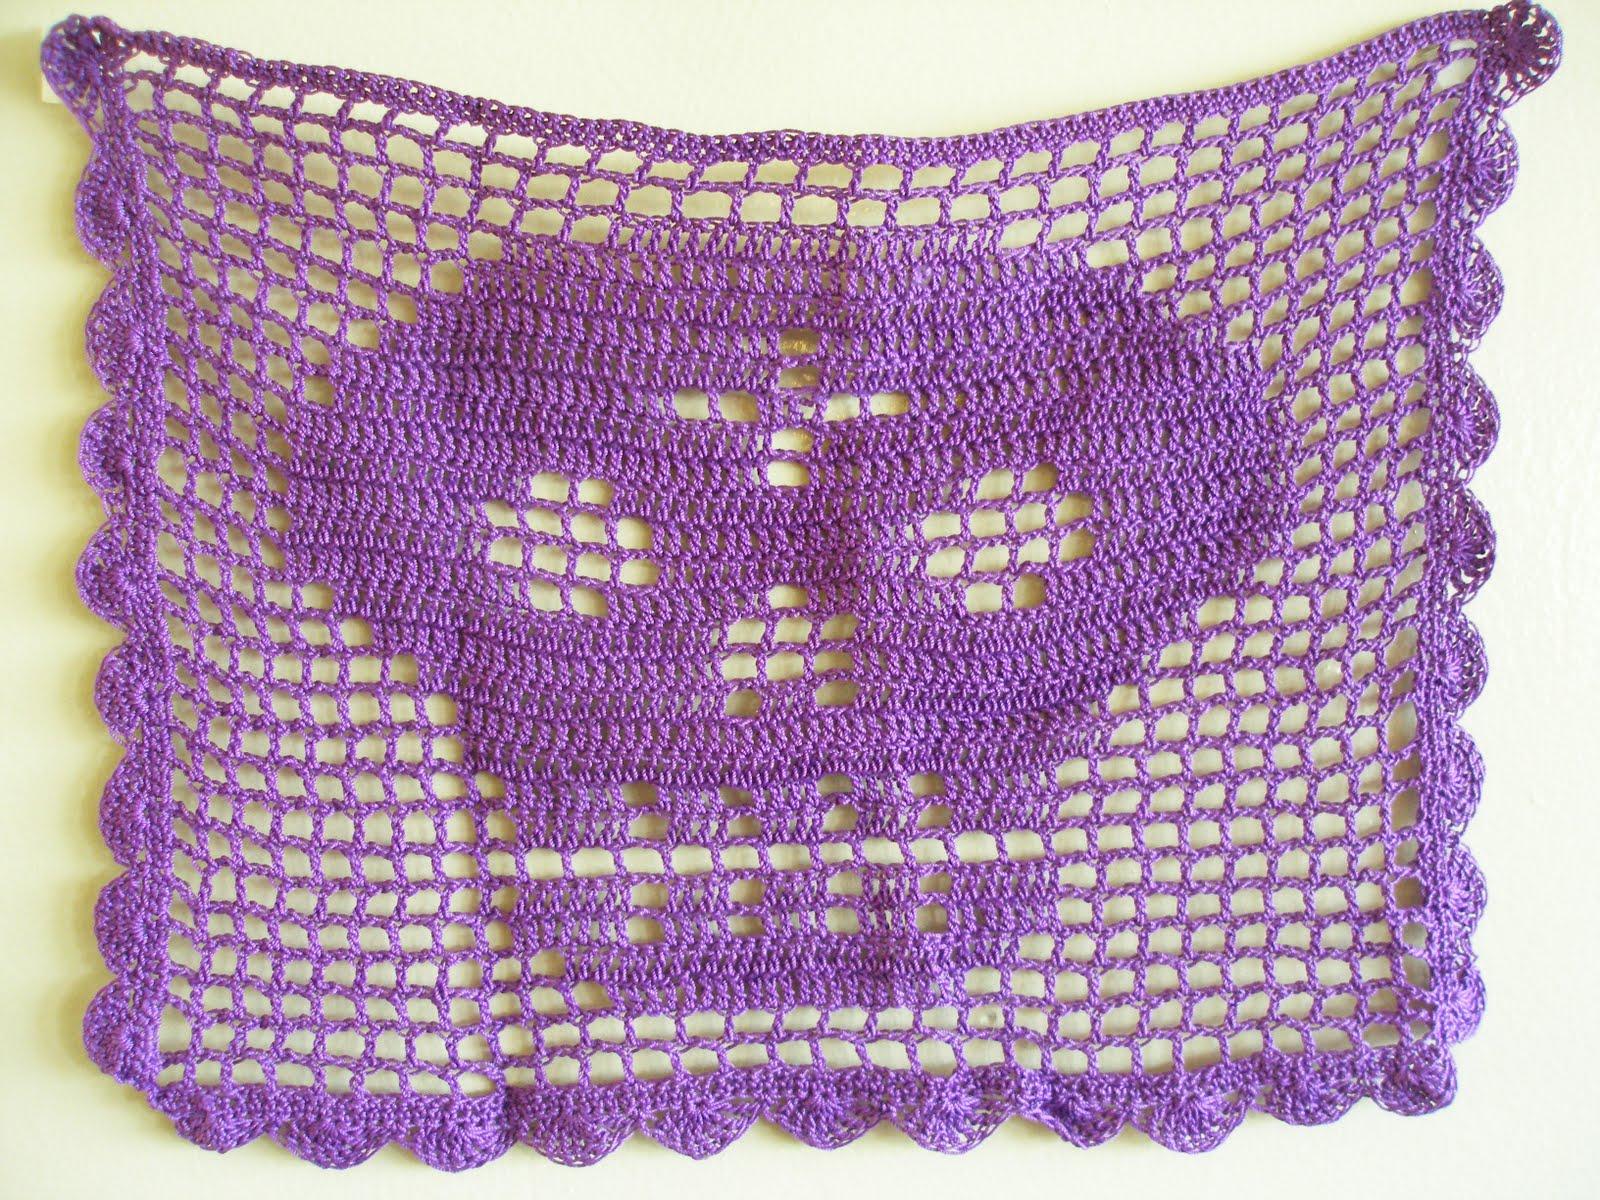 gurman fravor papel picado filet crochet chart. Black Bedroom Furniture Sets. Home Design Ideas